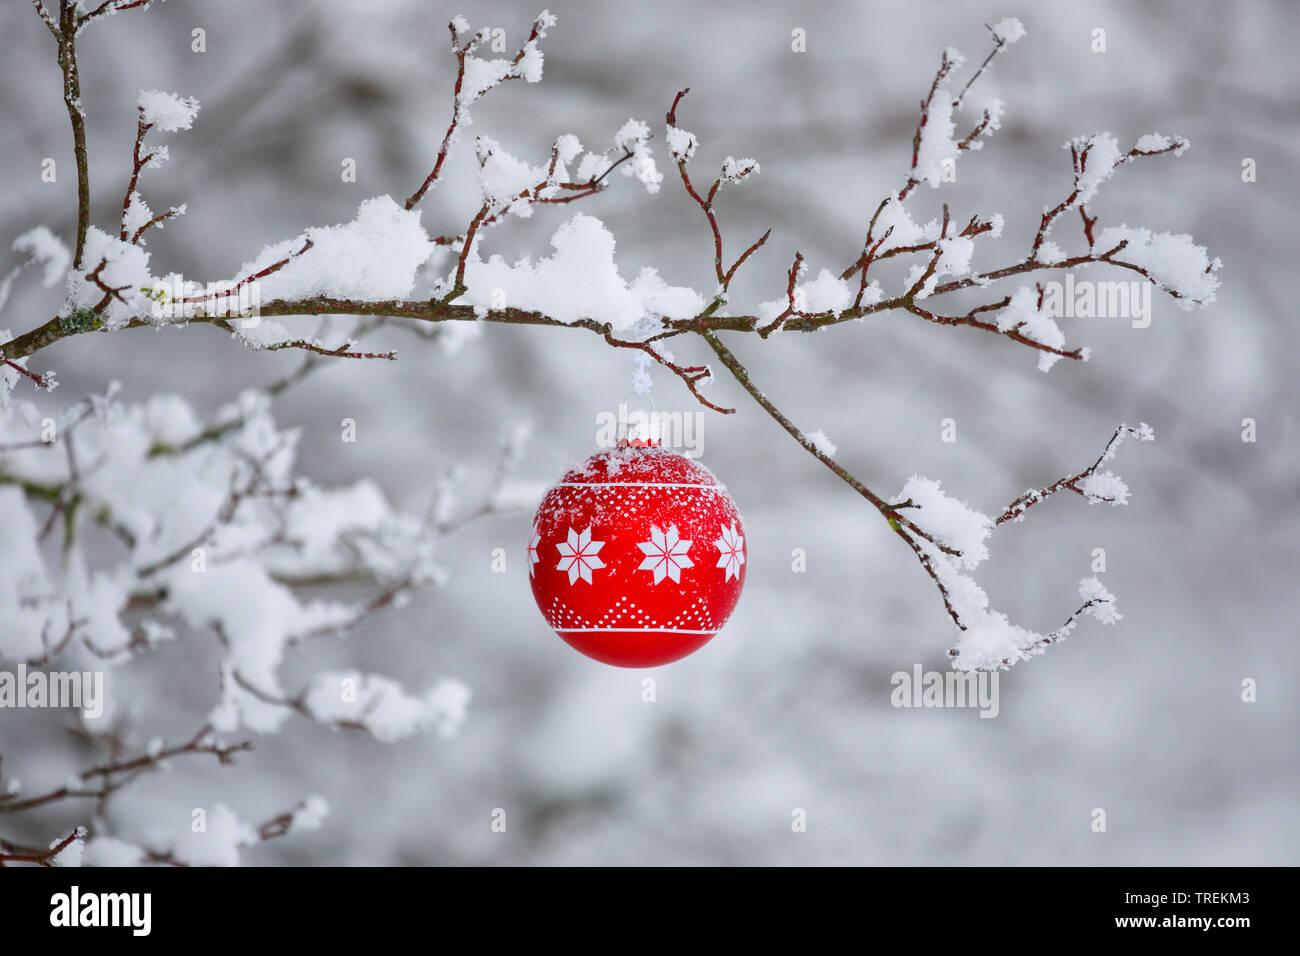 Weihnachtskugel an einem verschneiten Ast, Schweiz   Christmas ball at a snow-covered branch, Switzerland   BLWS528483.jpg [ (c) blickwinkel/P. Frisch - Stock Image